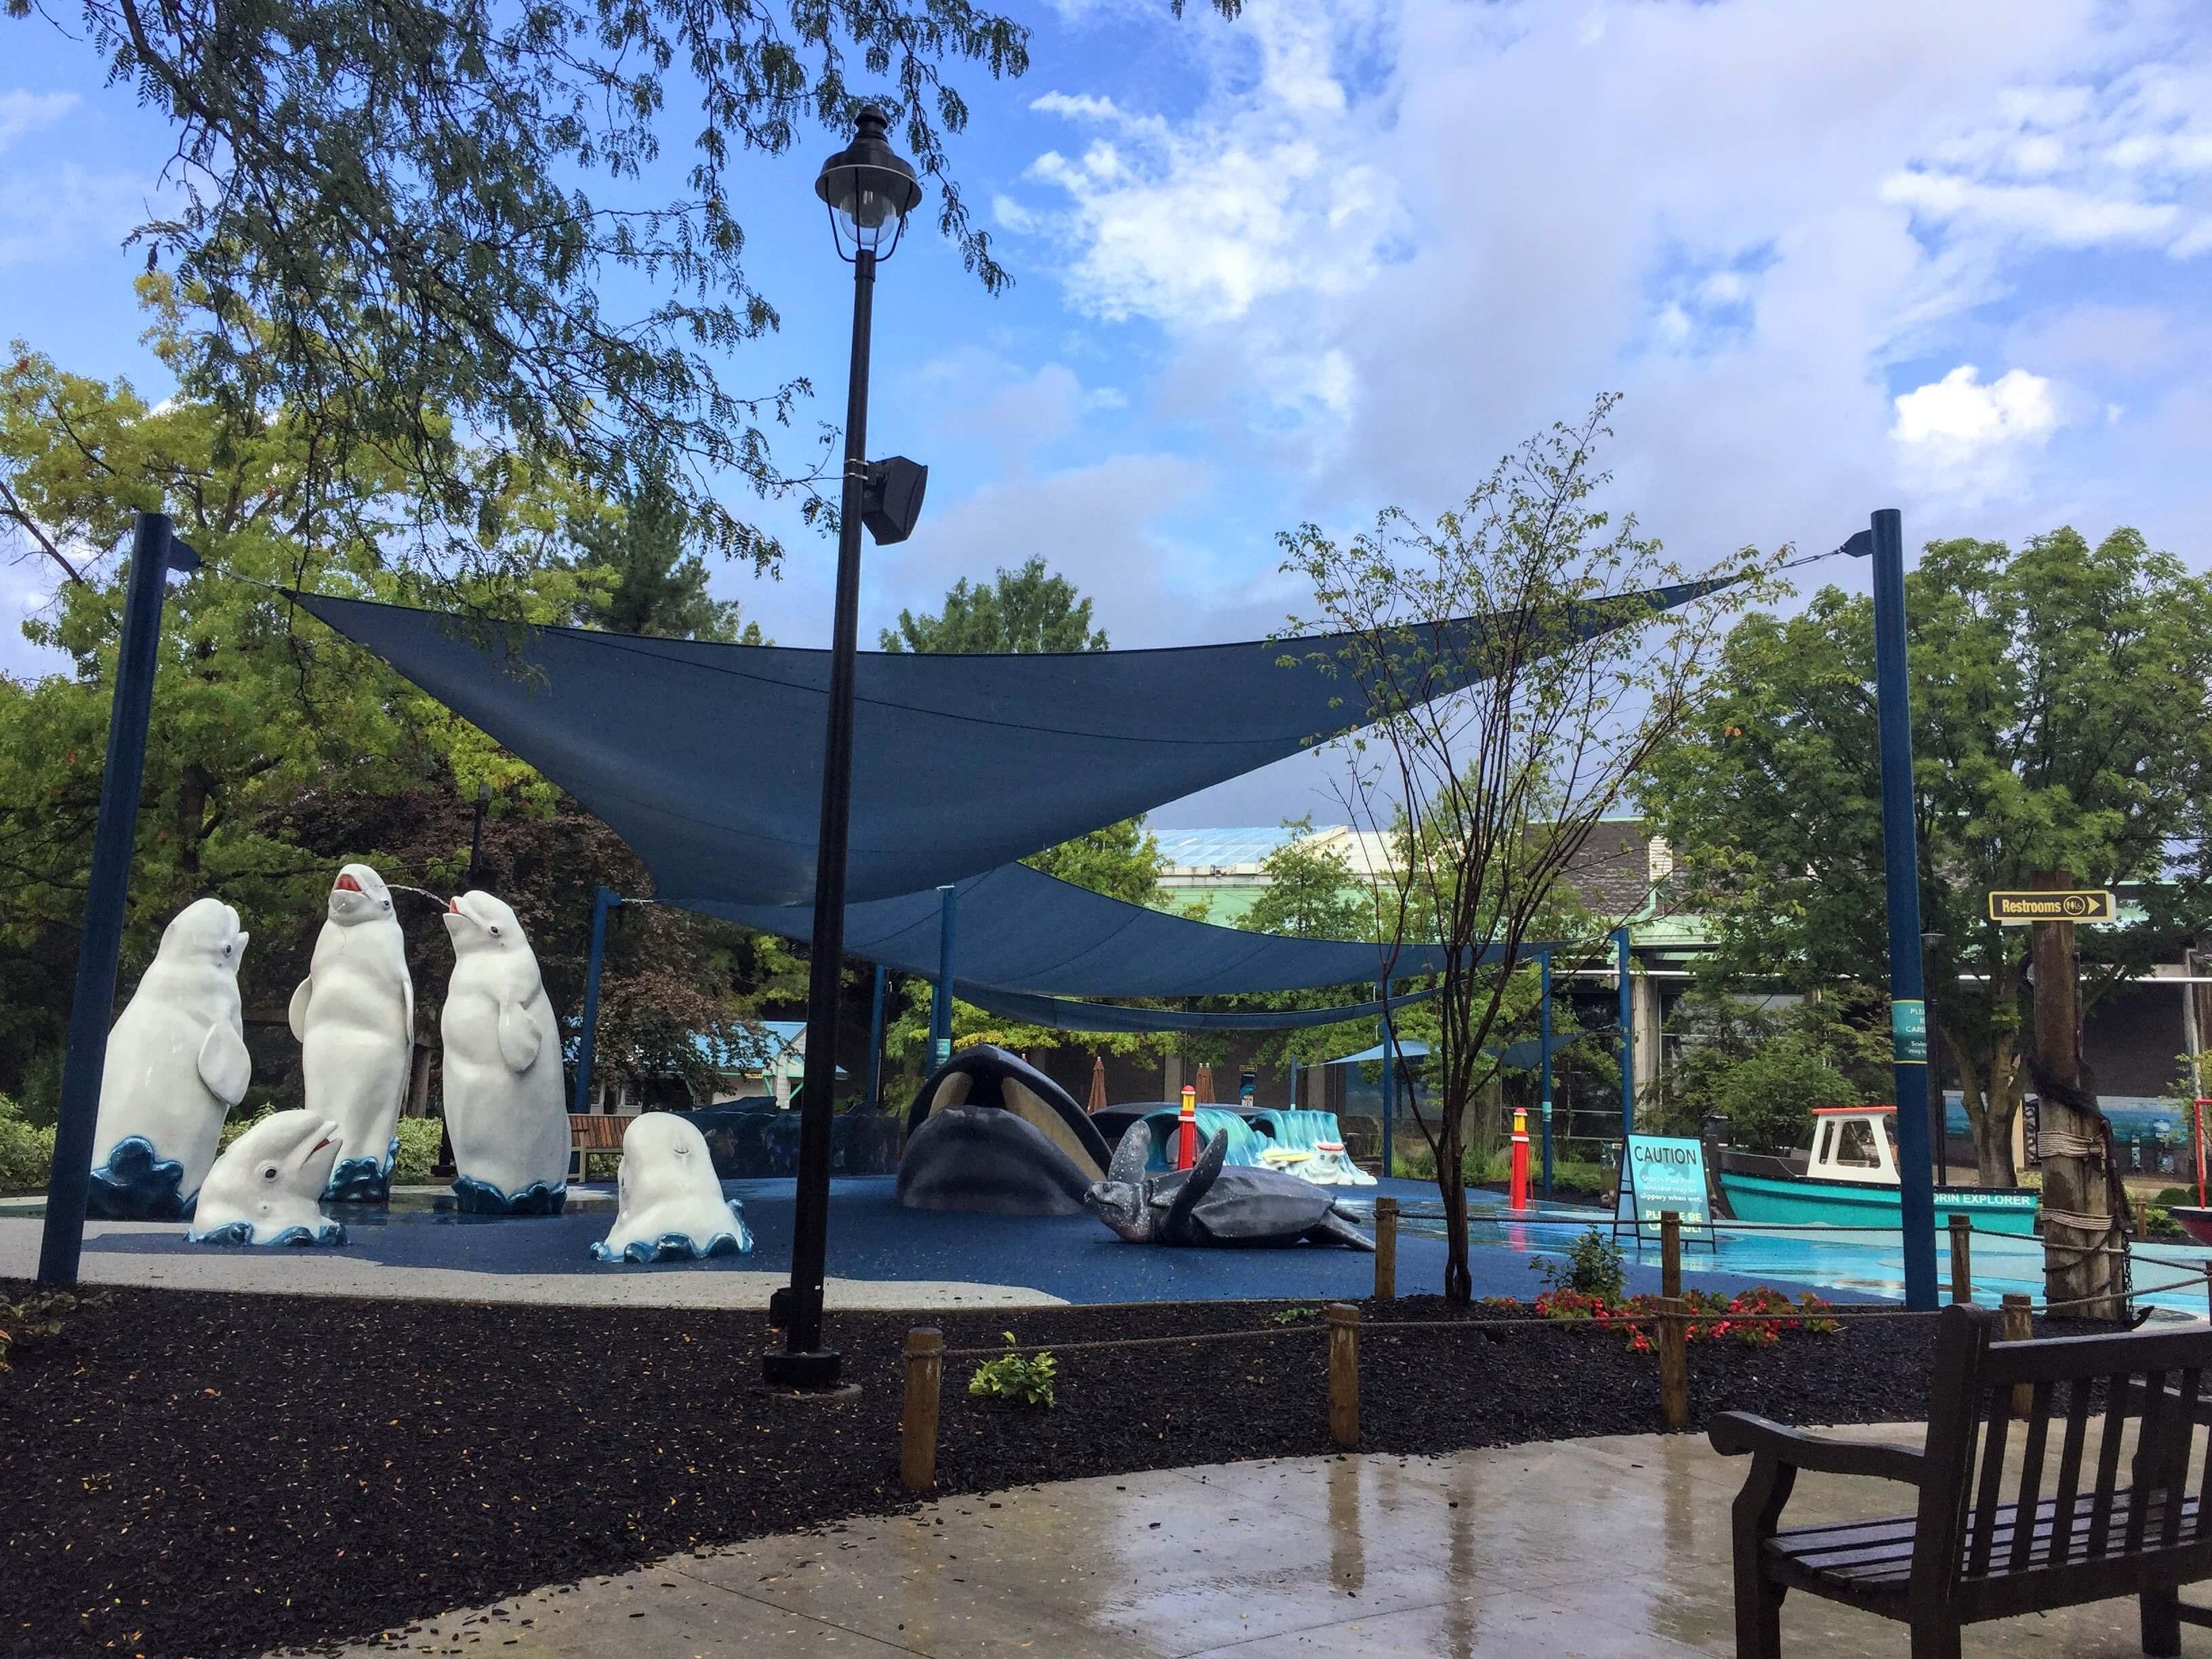 Columbus Zoo Play Area